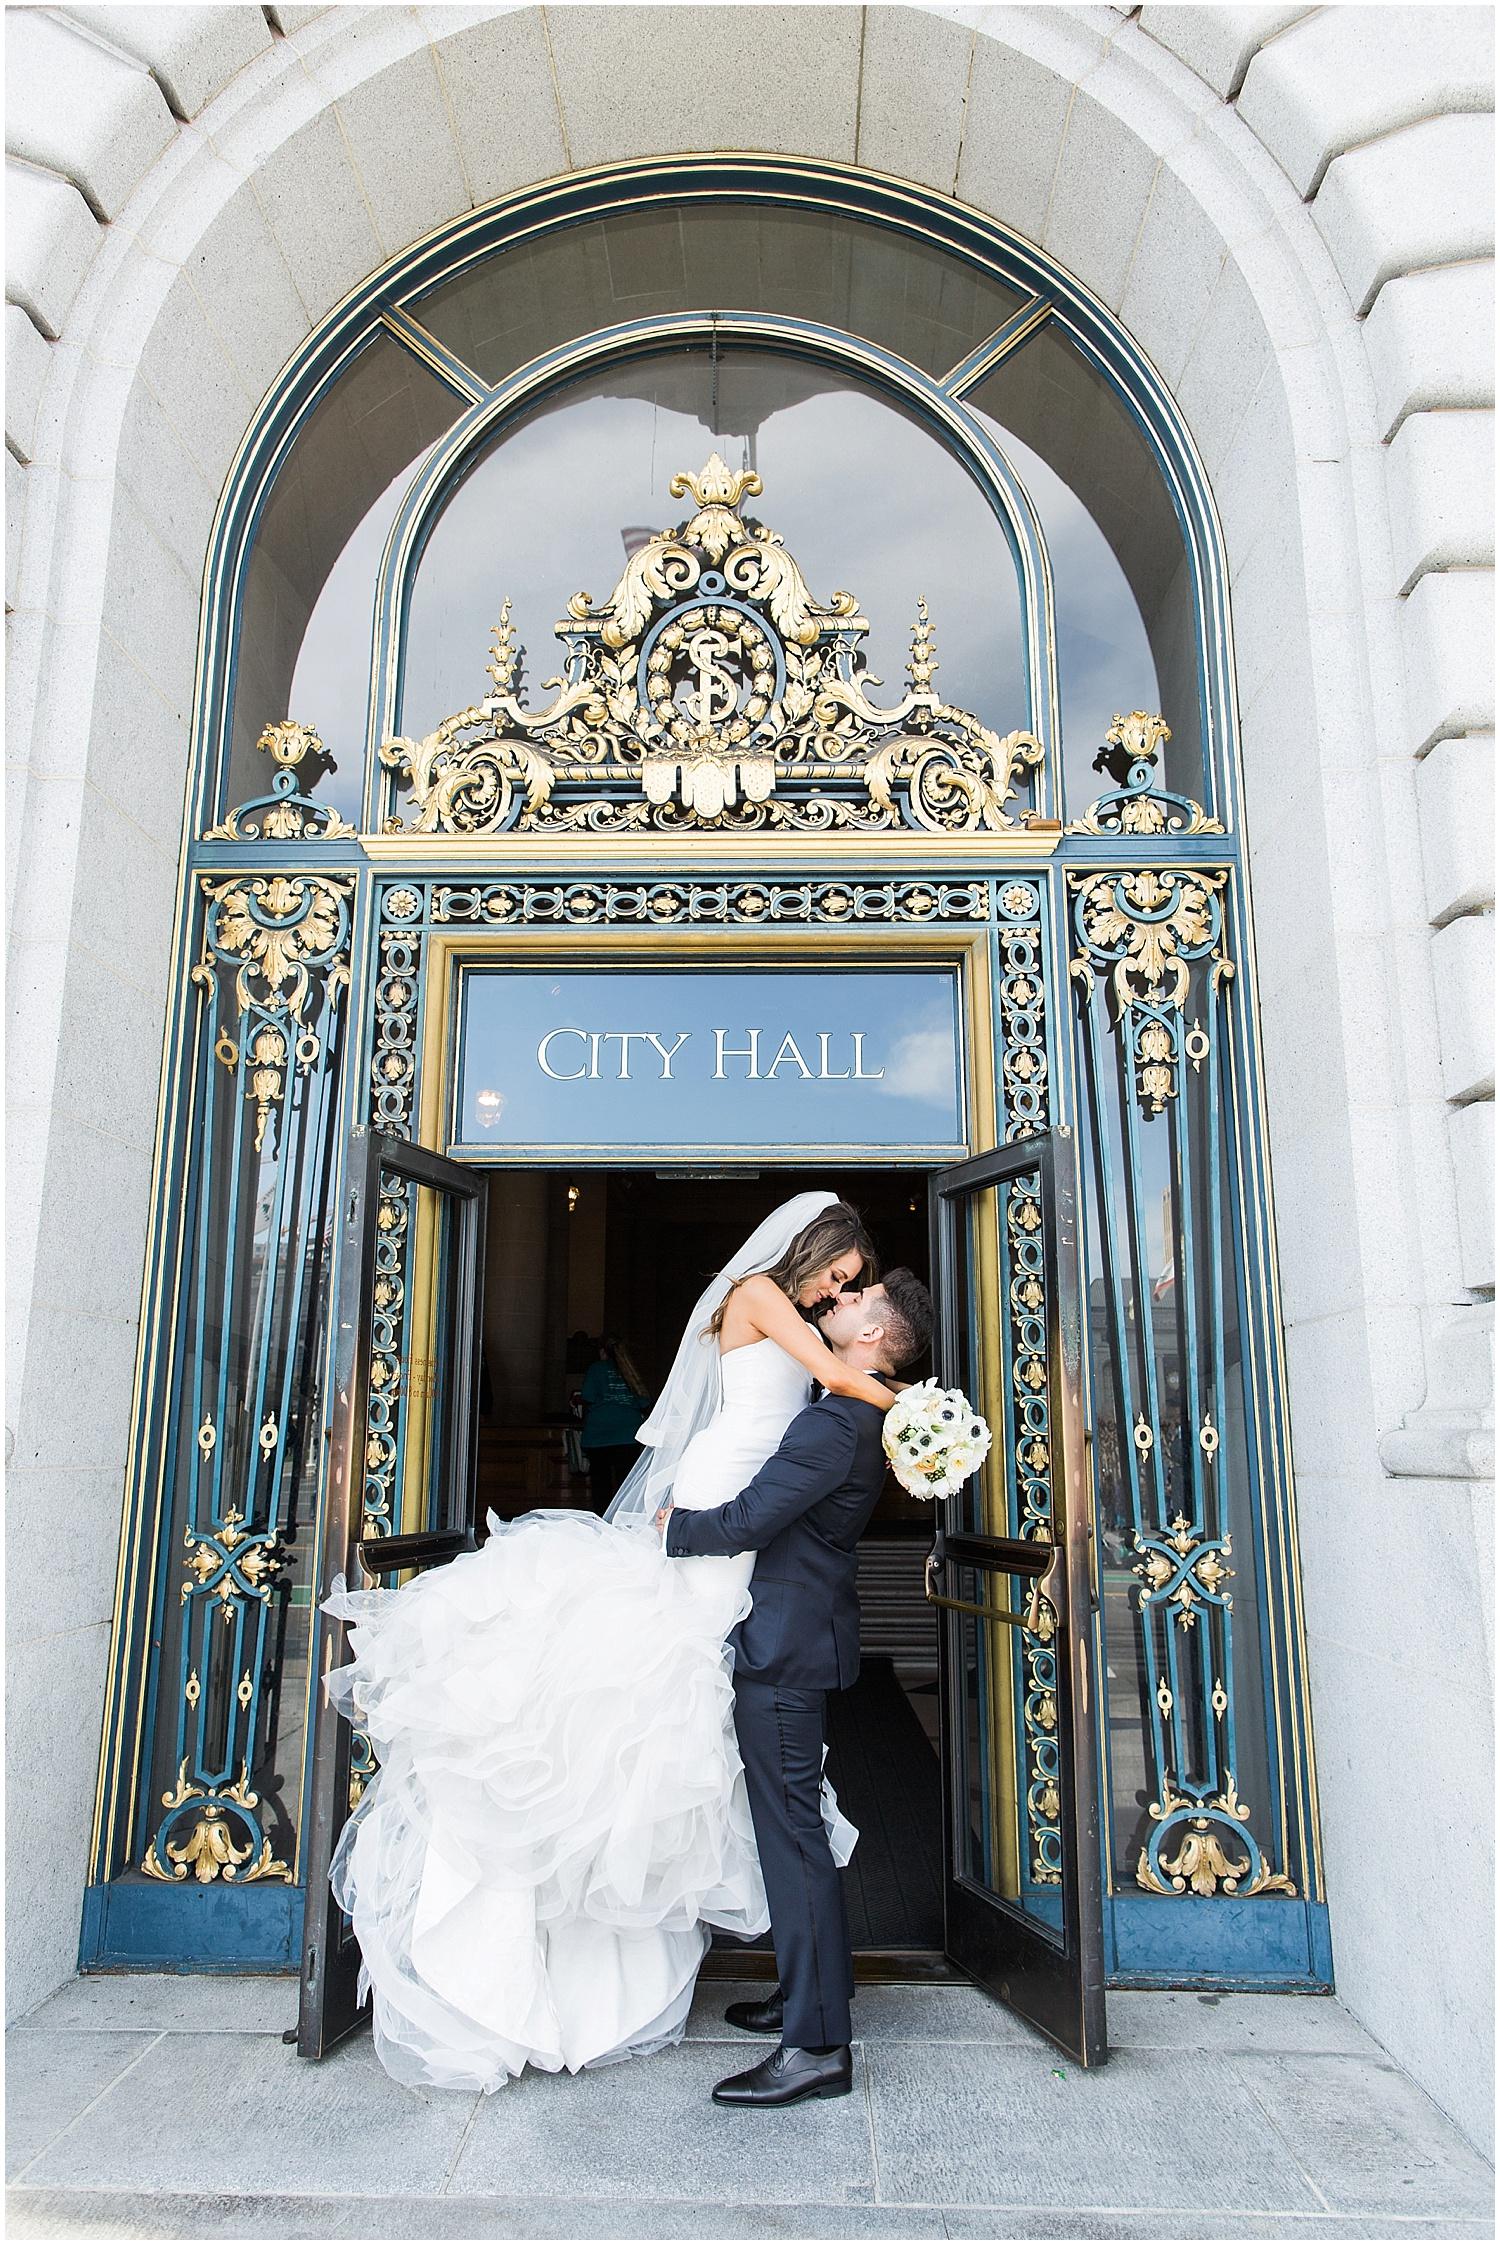 Best_SF_ctiy_hall_wedding_photographer-020.jpg